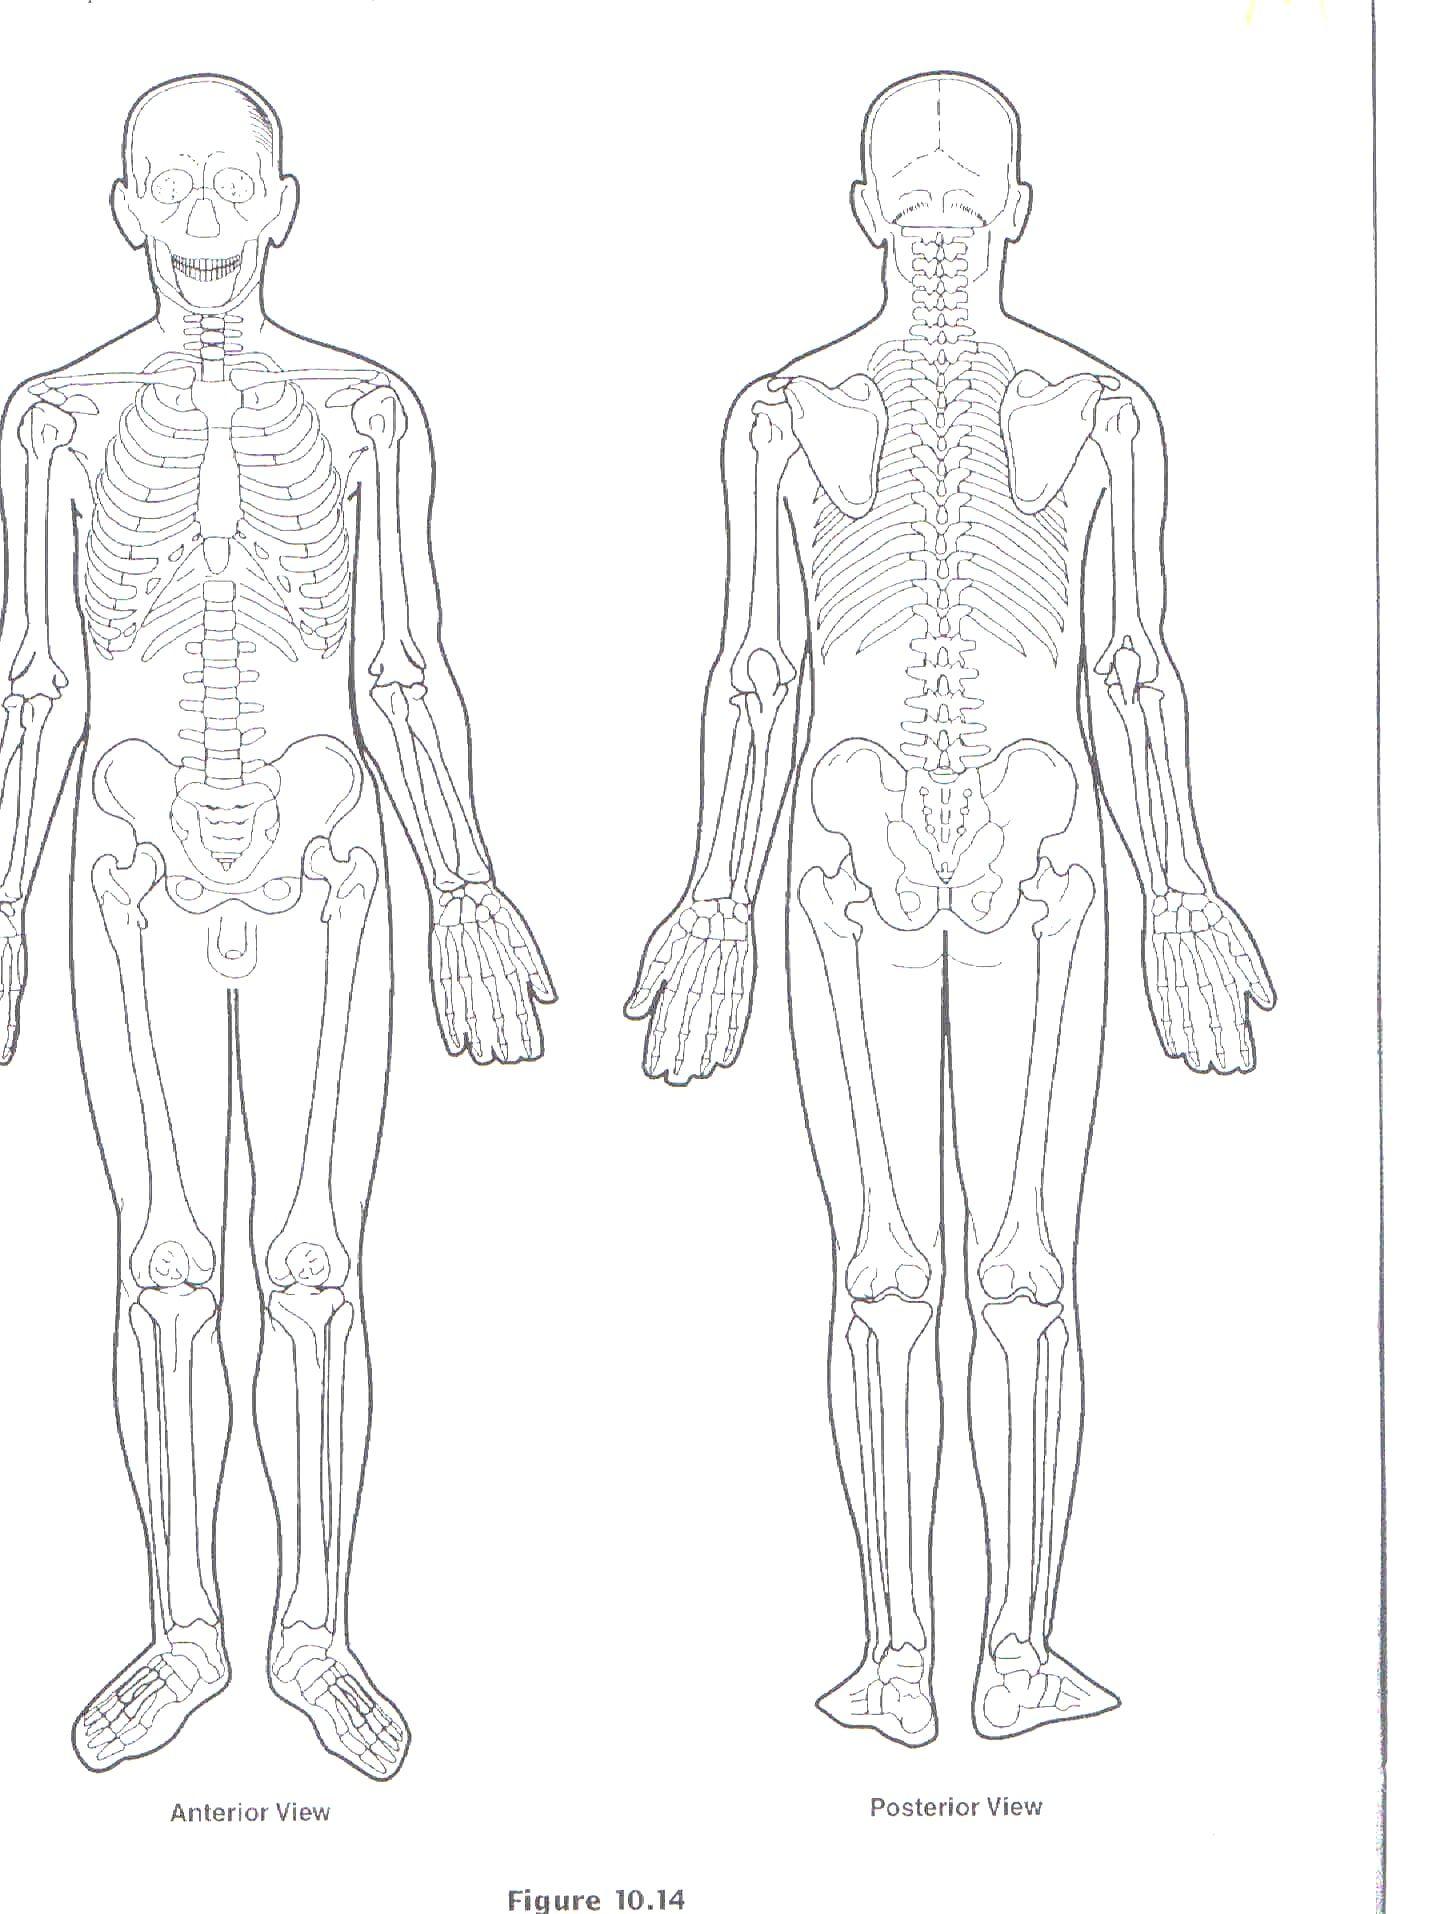 Muscle Diagram Blank | Human body diagram, Body diagram ...